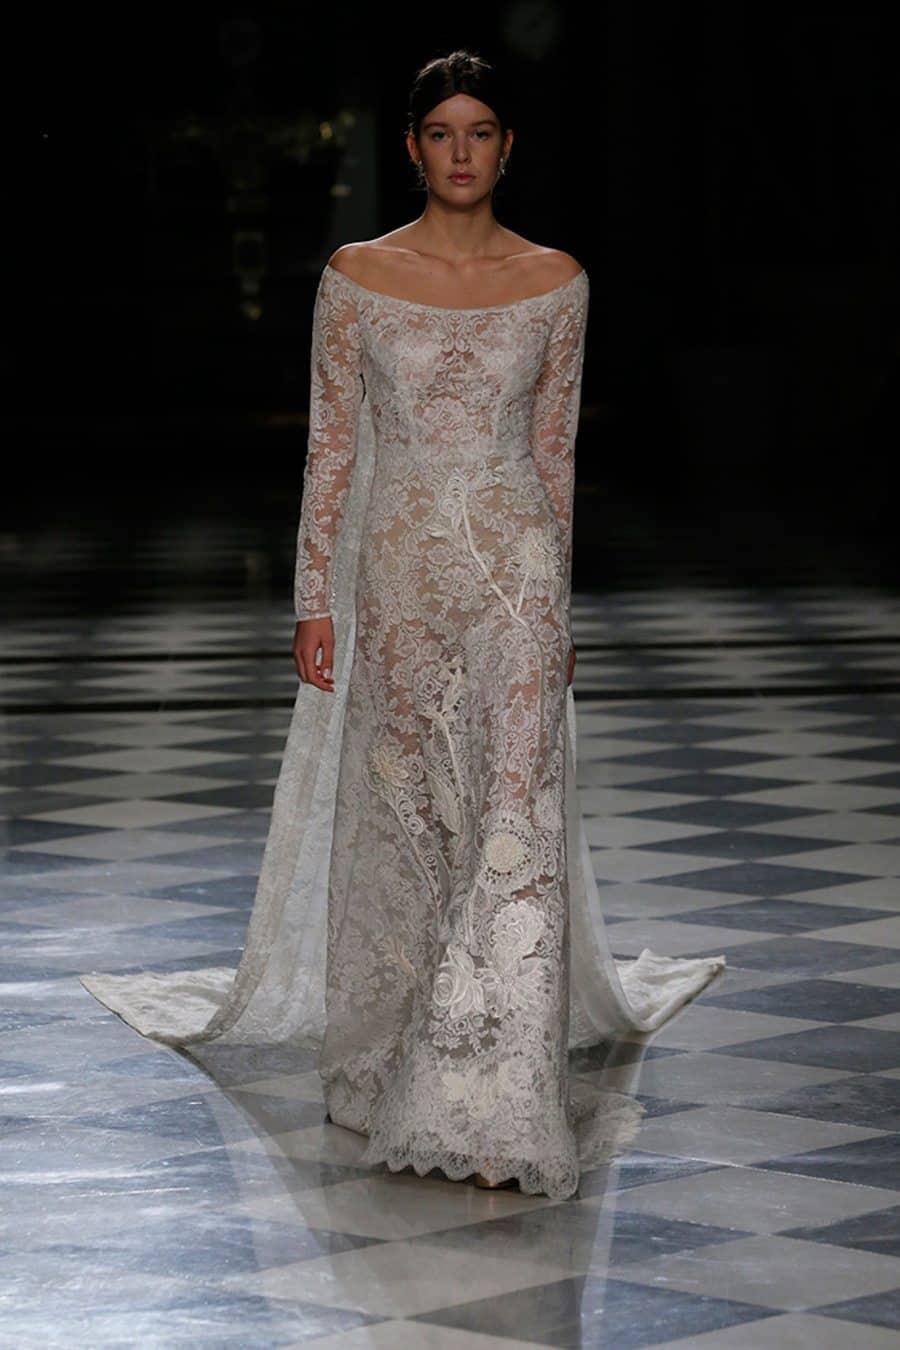 bride-high-fashion-couture-weddingdress-wedding-bridedress-couturedress-highfashion-yolancris-61